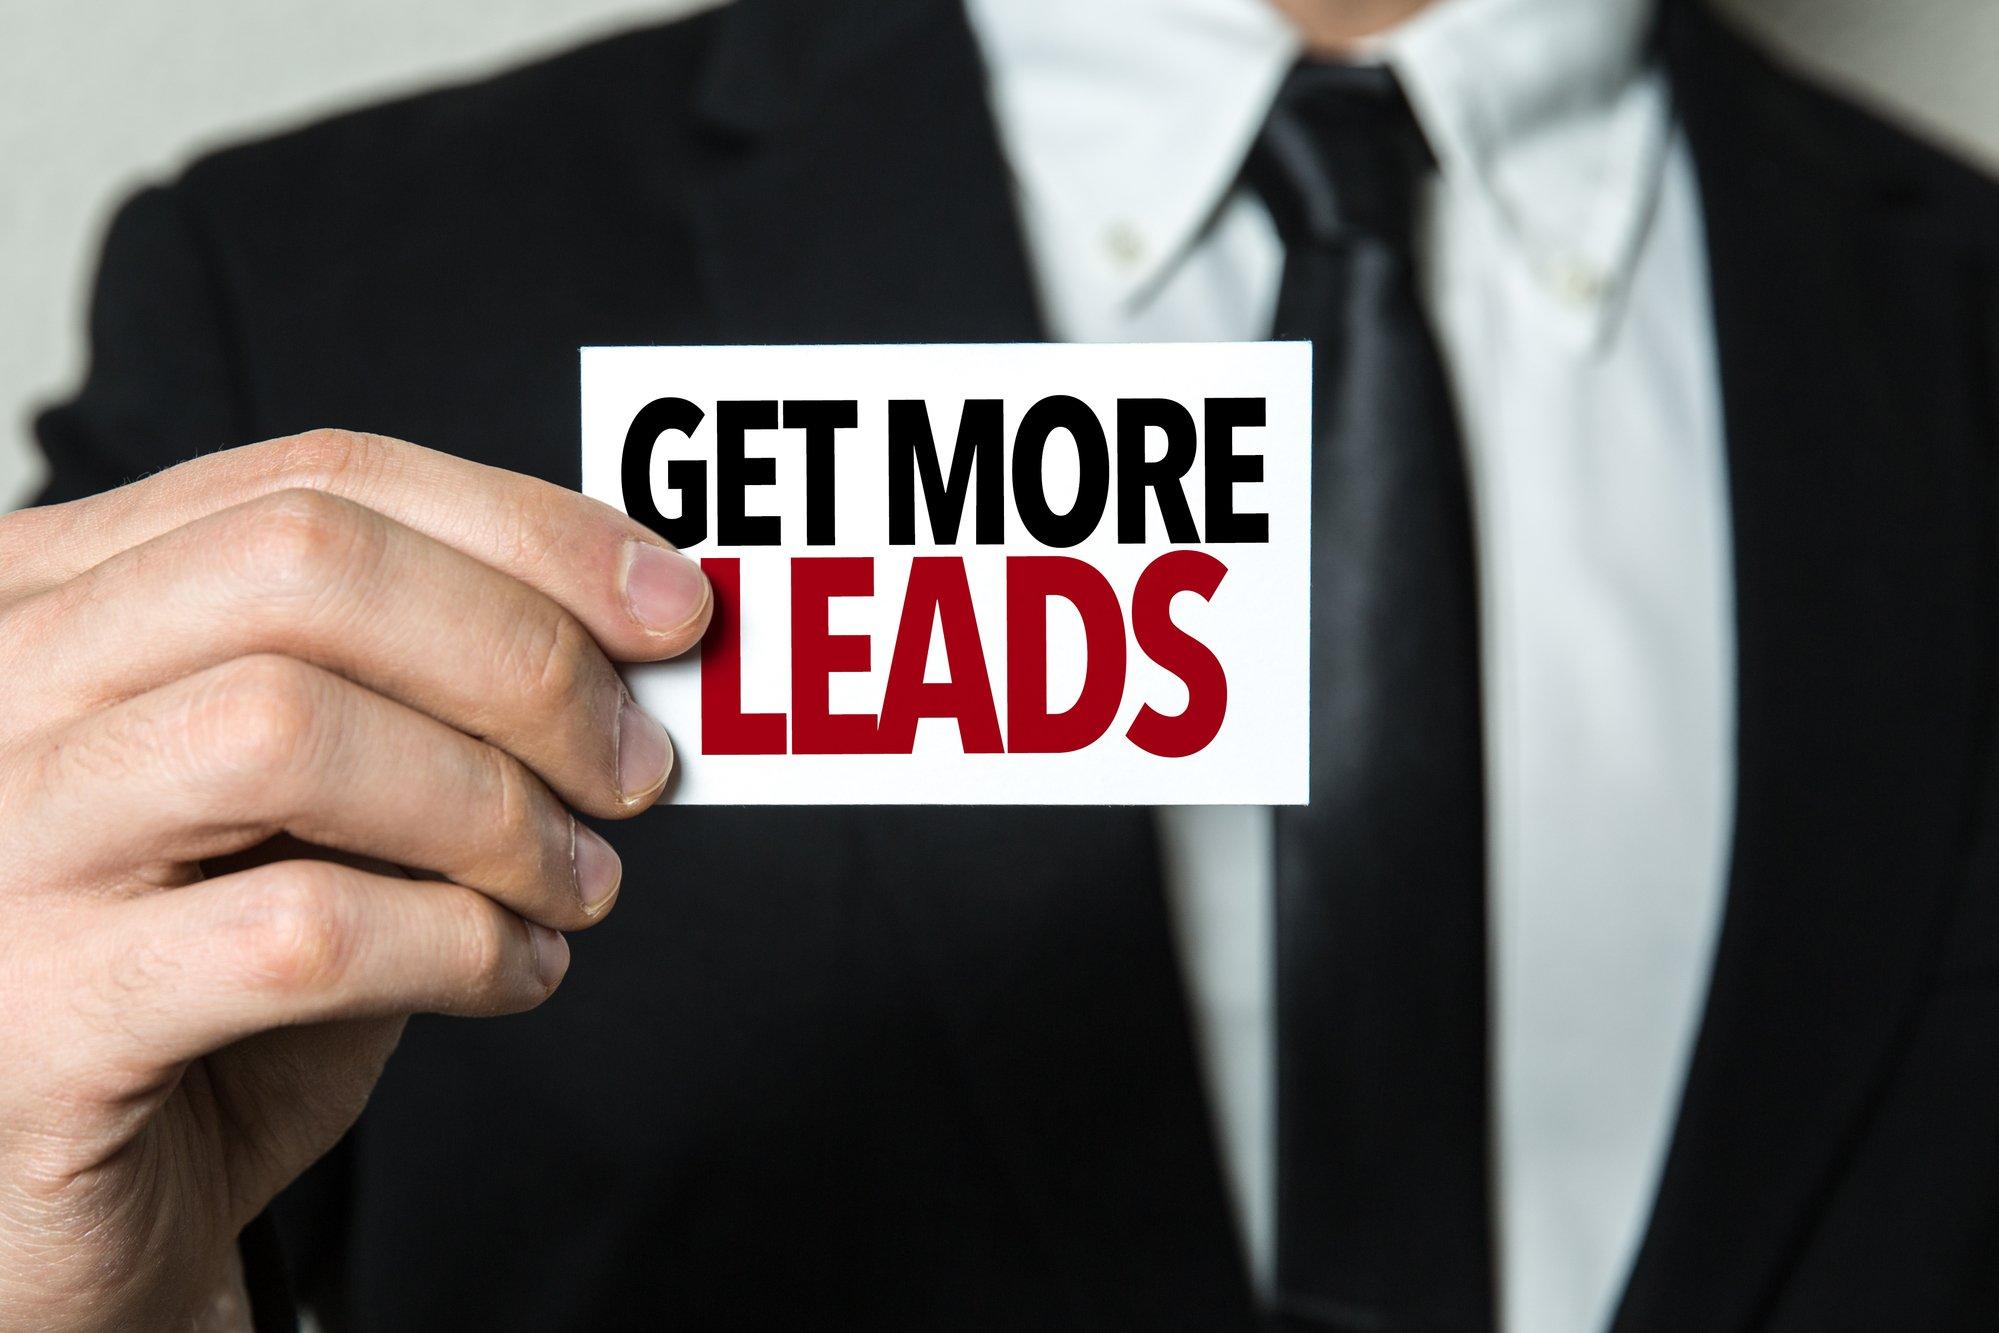 digital marketing services from OneCom Media & Marketing